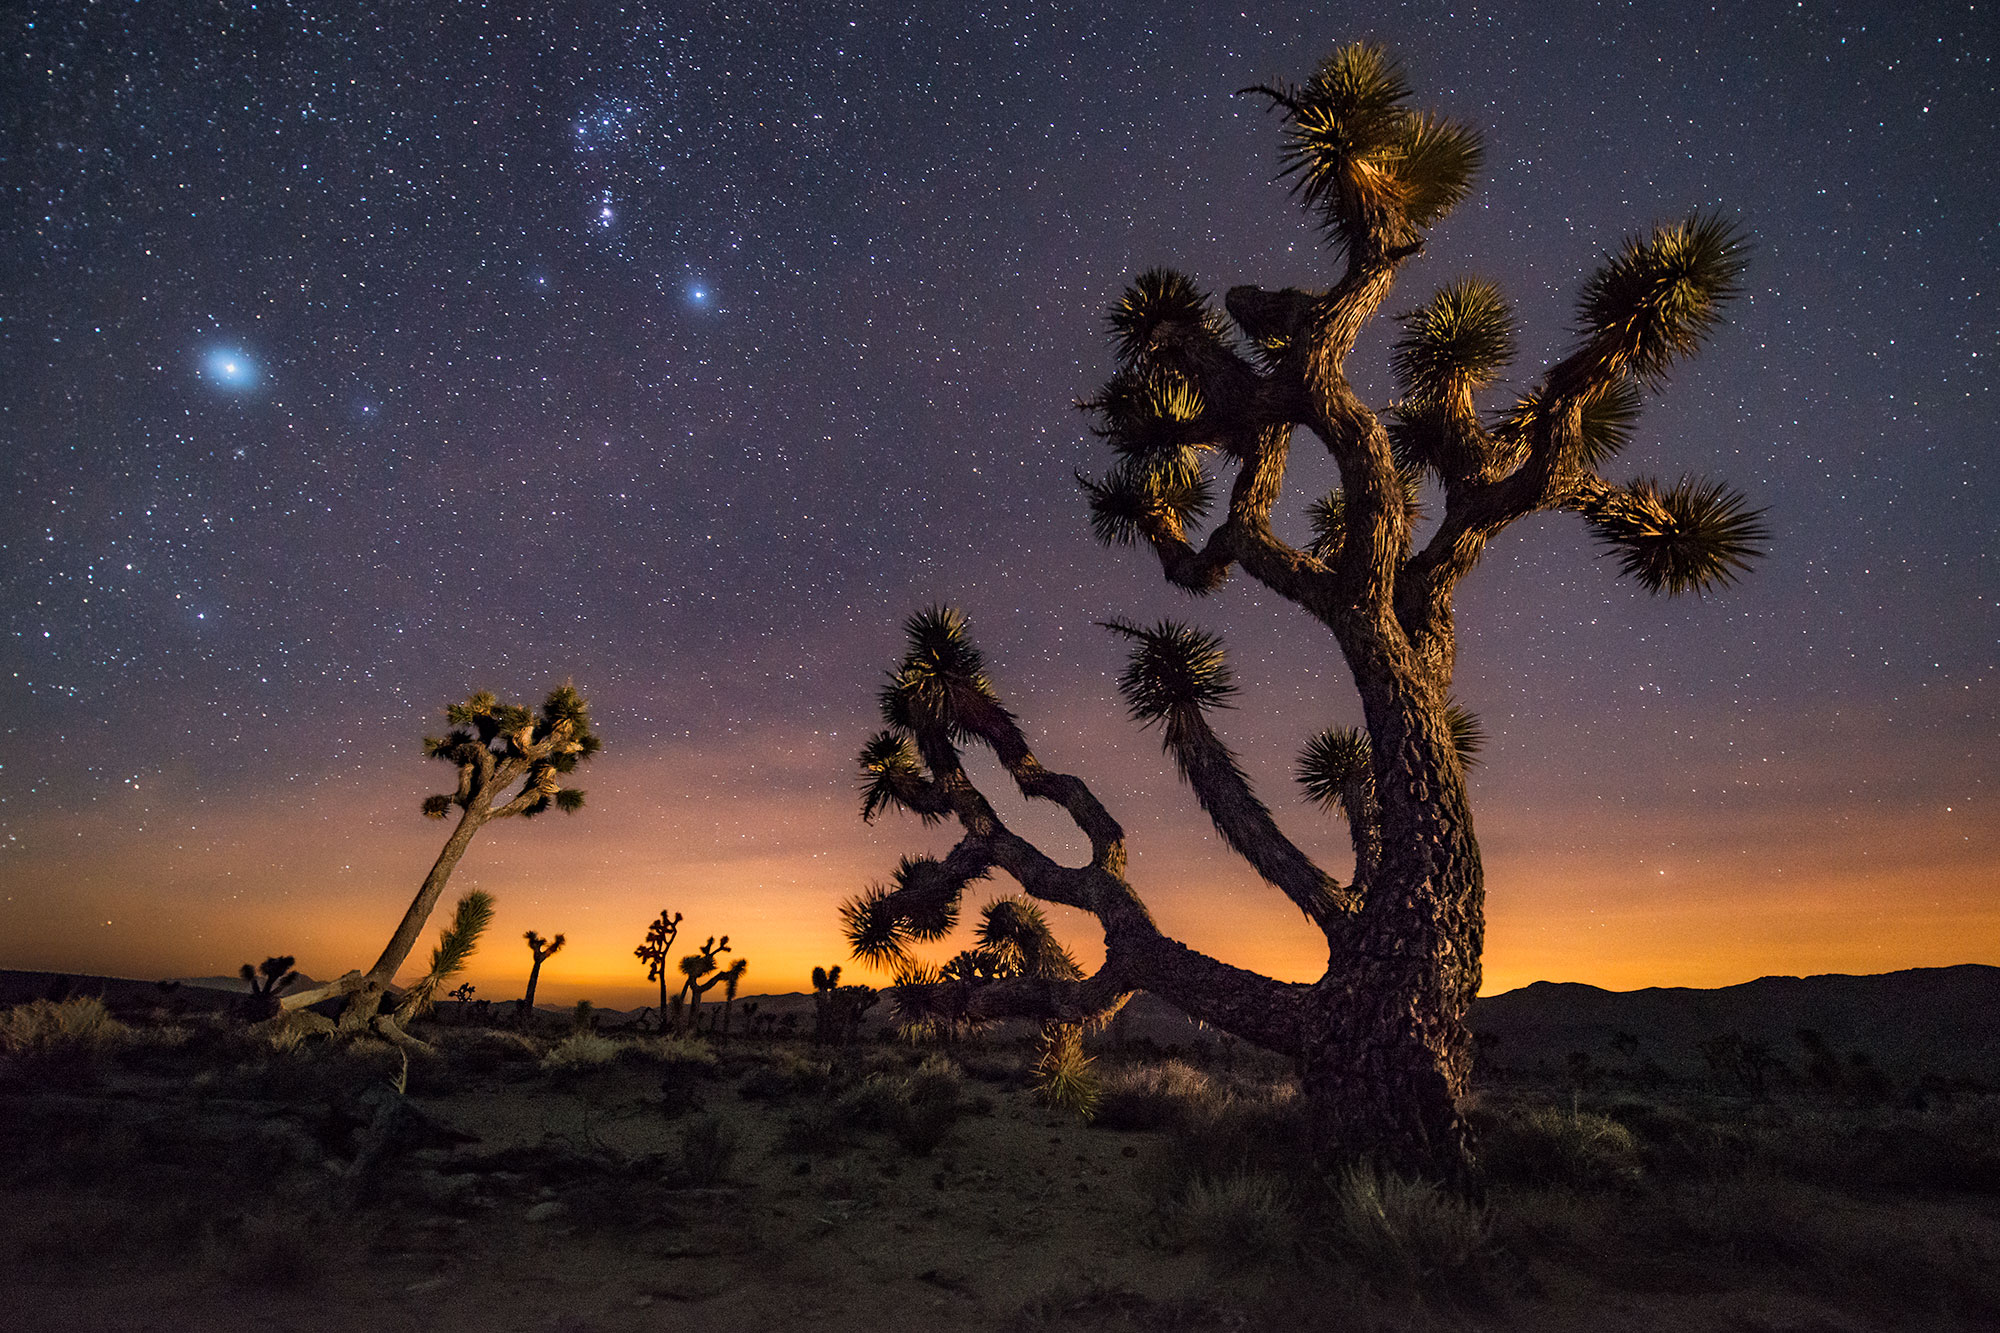 Joshua Tree at Lee Flat - Death Valley, CA